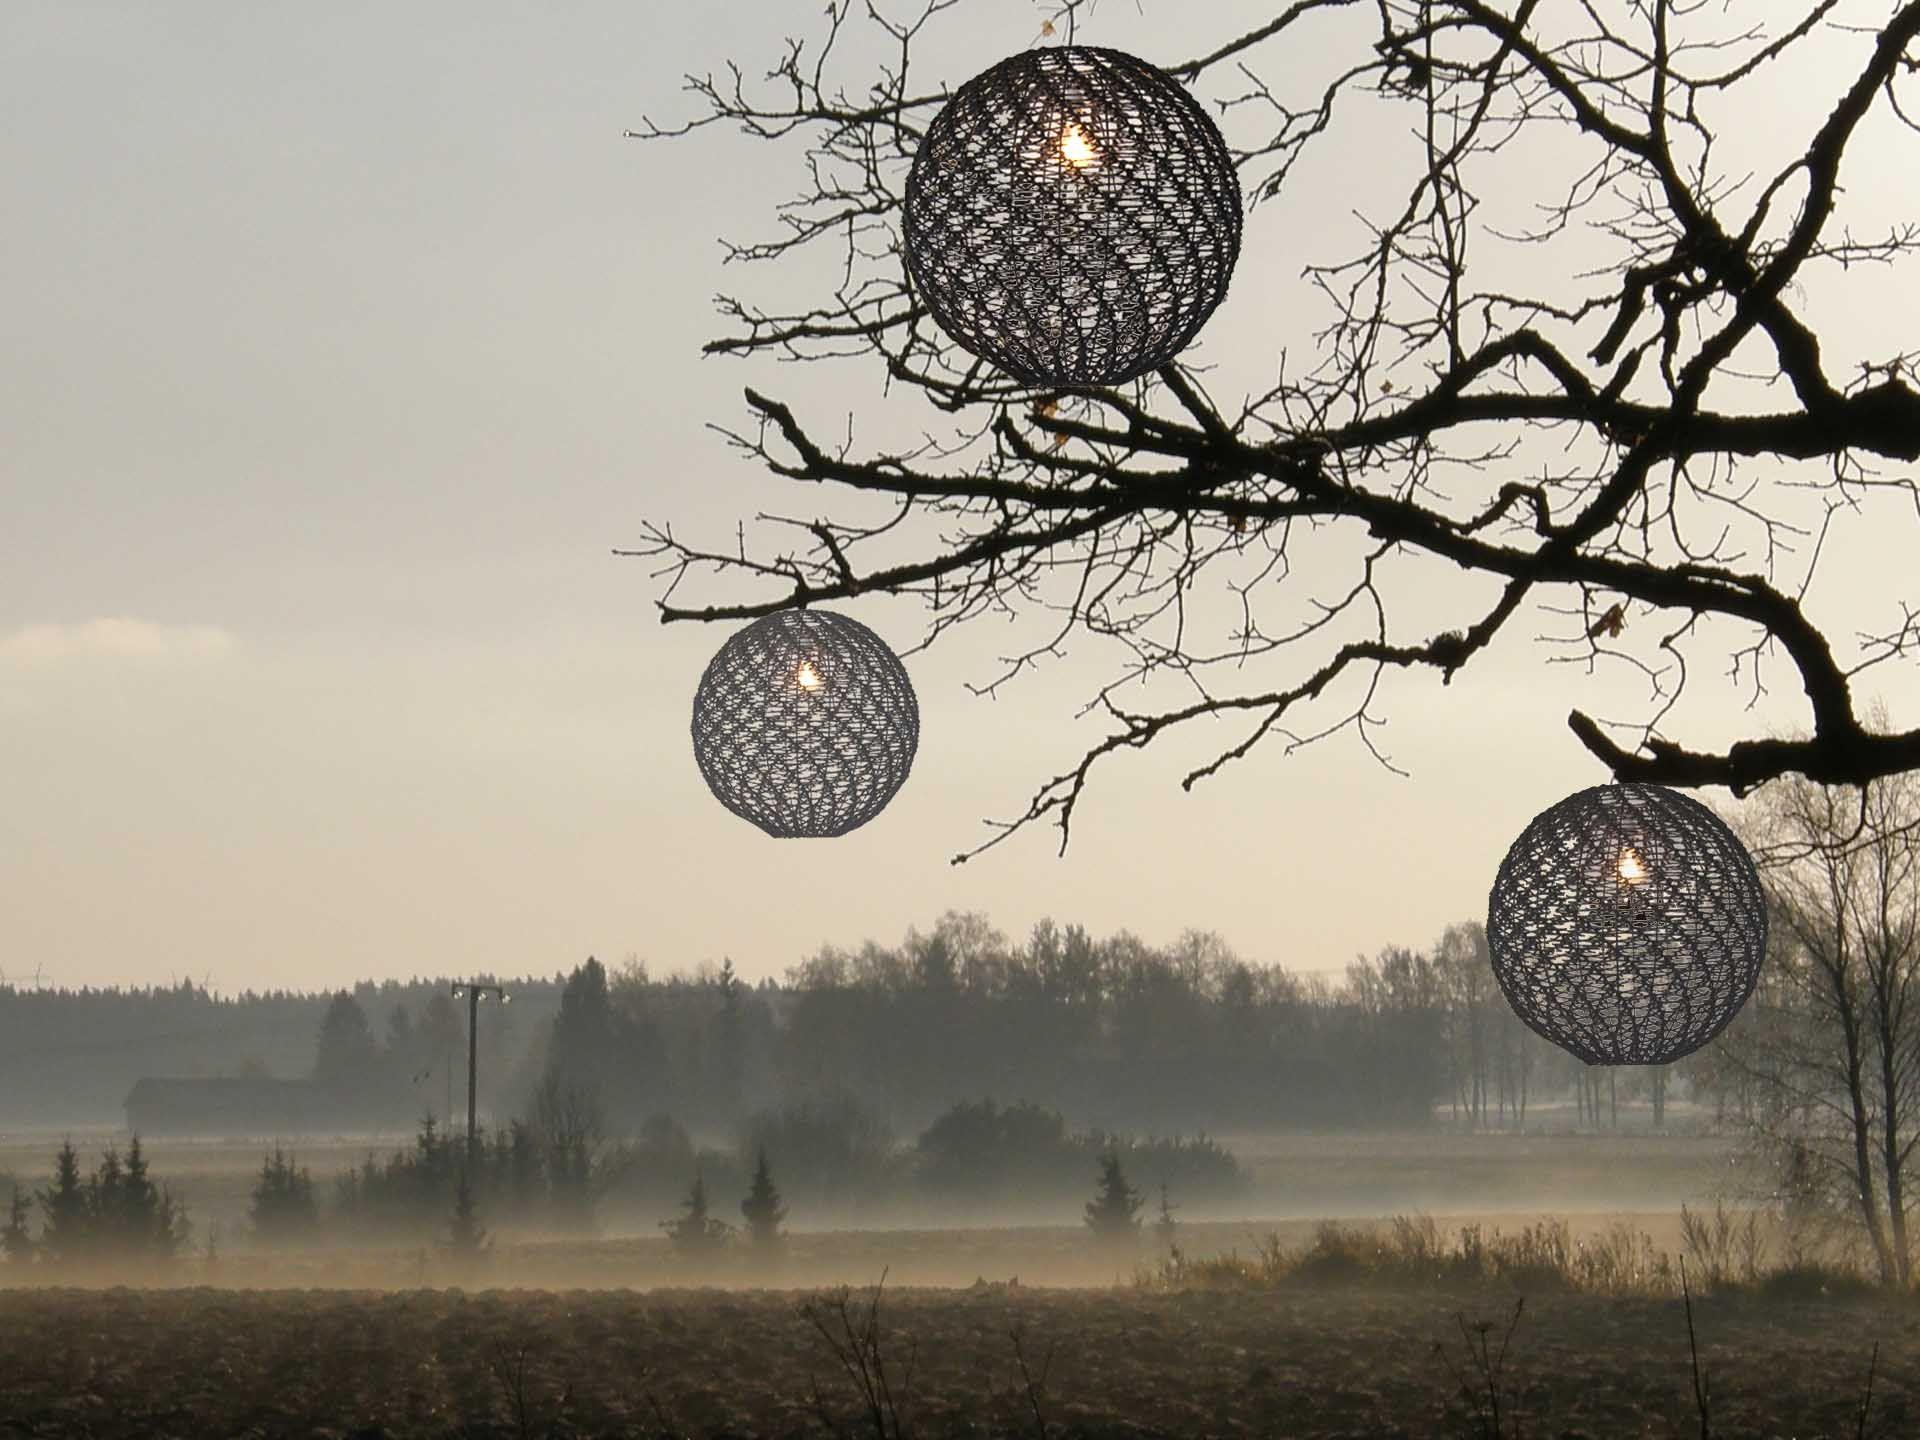 Crocheted_fair_lampshade